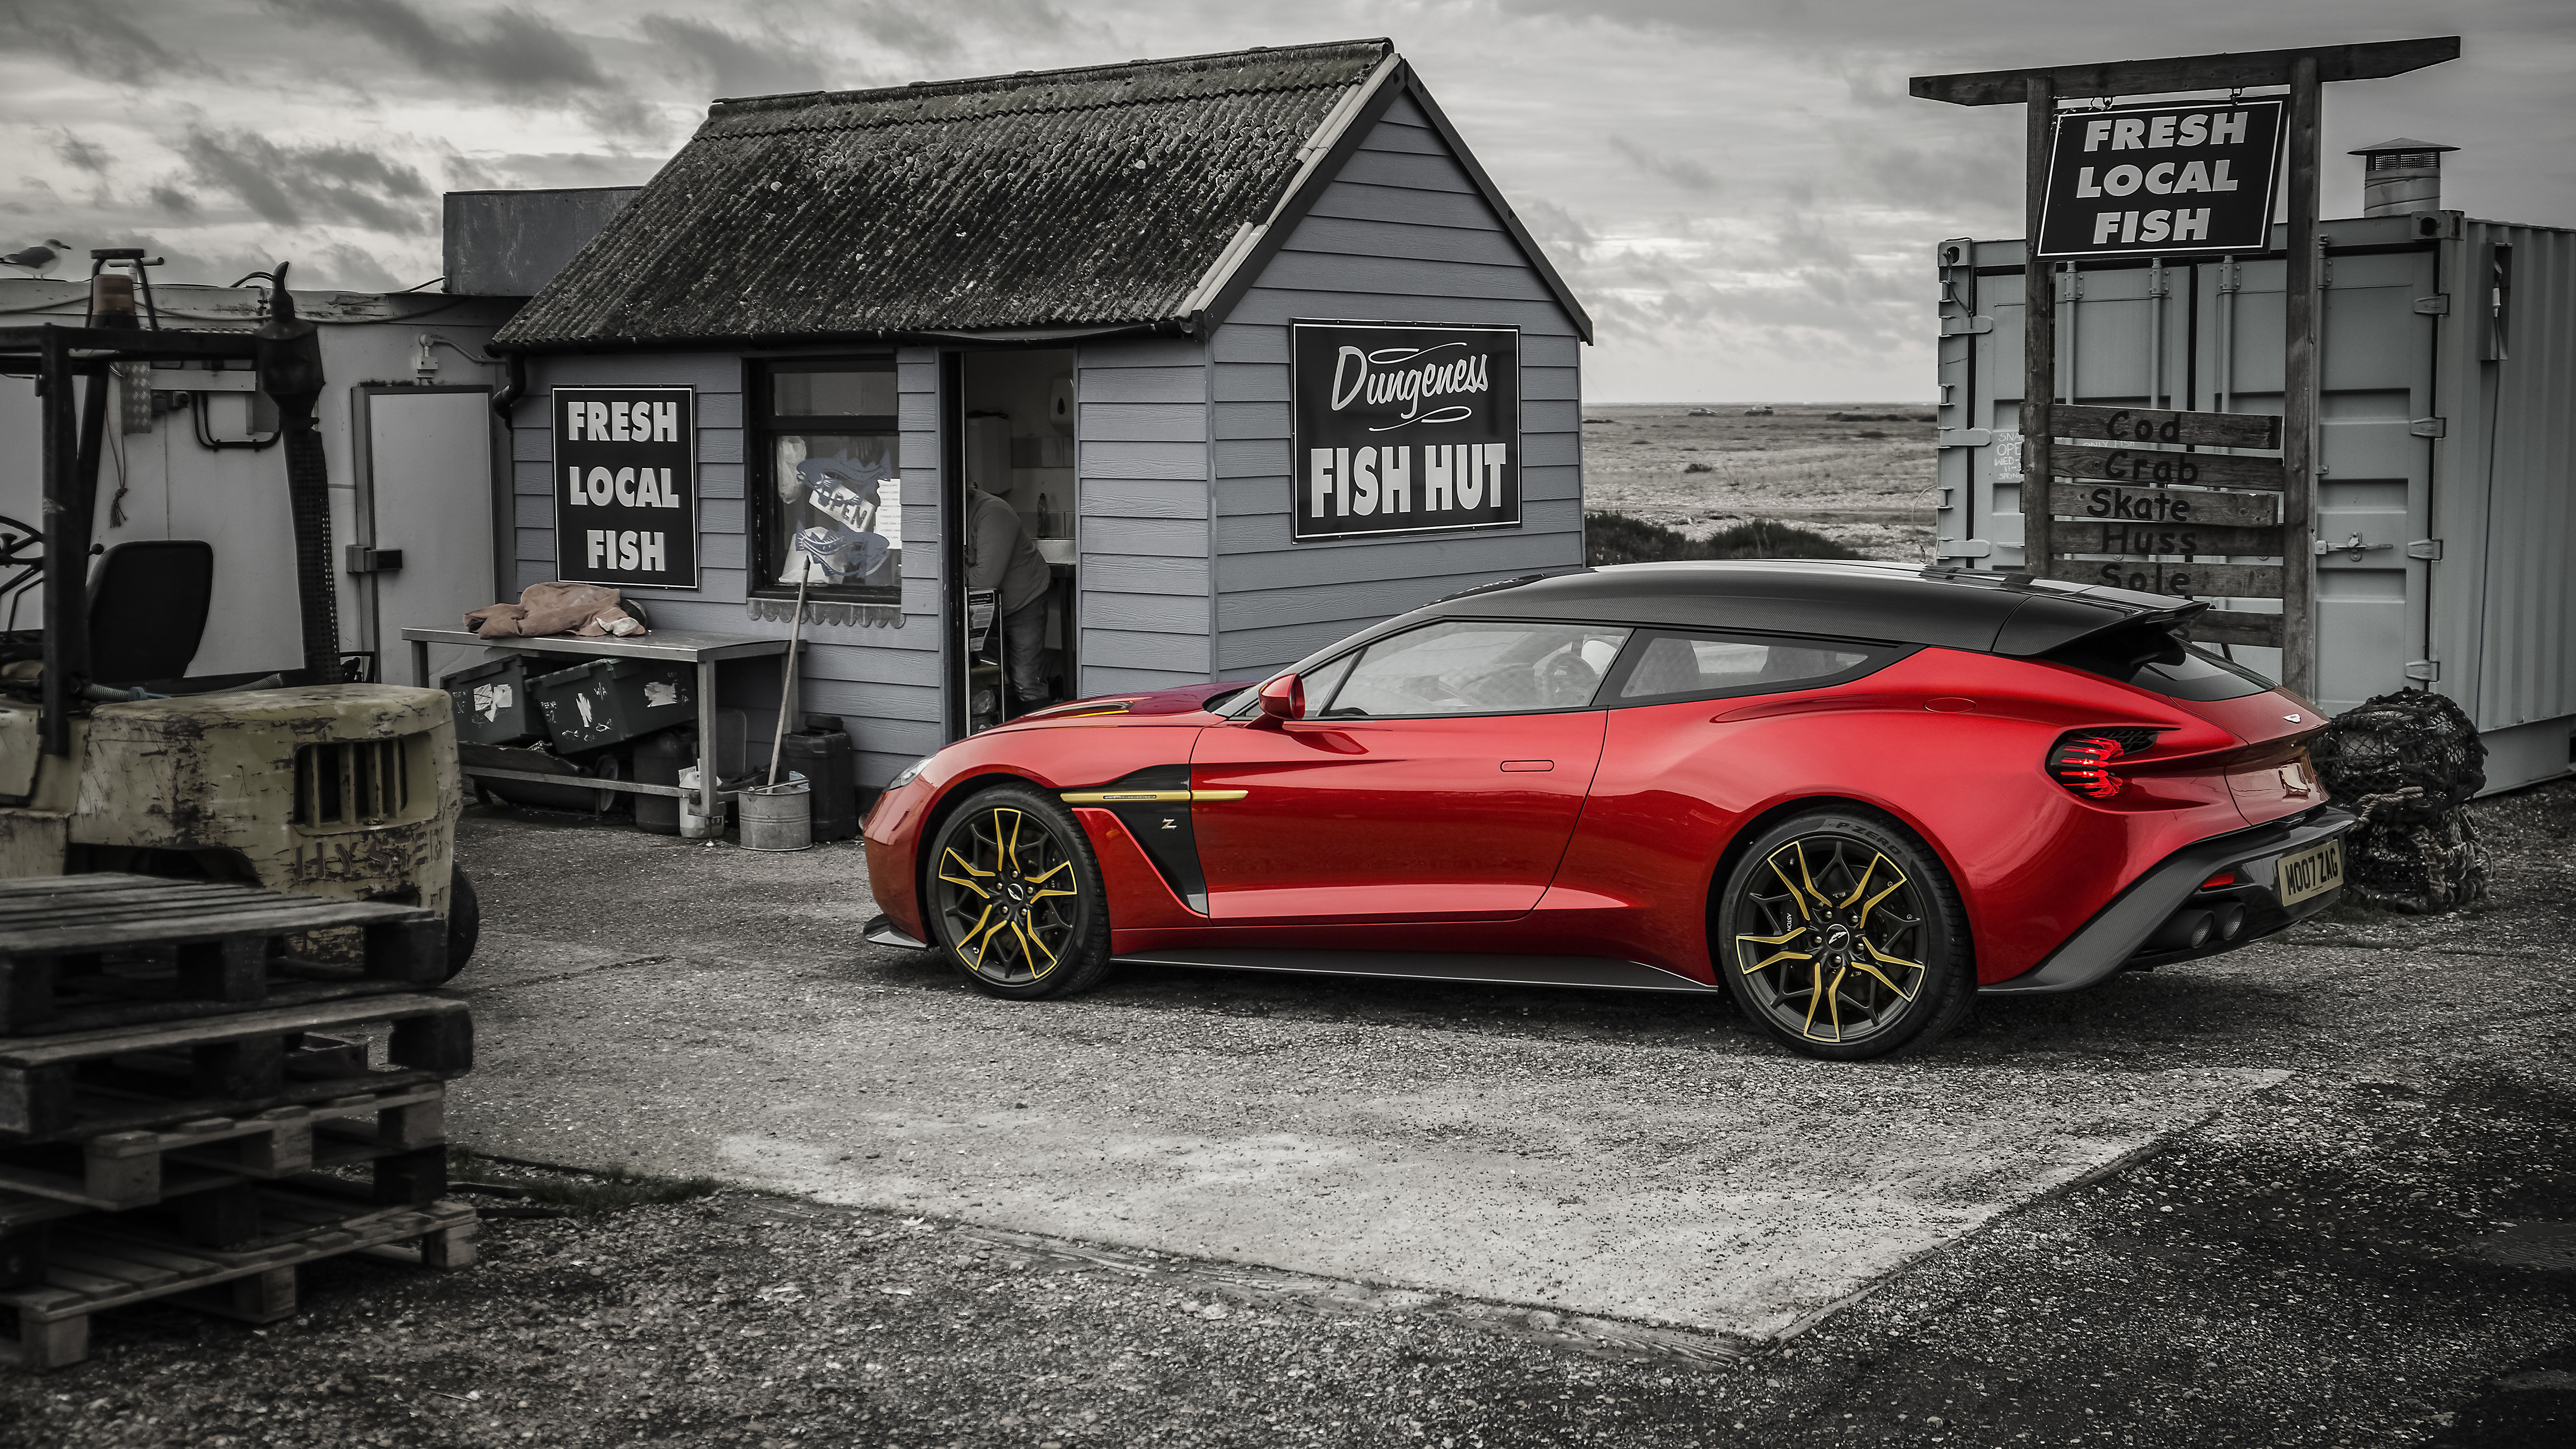 Aston Martin Vanquish Zagato Shooting Brake 4k Wallpaper Hd Car Wallpapers Id 12284